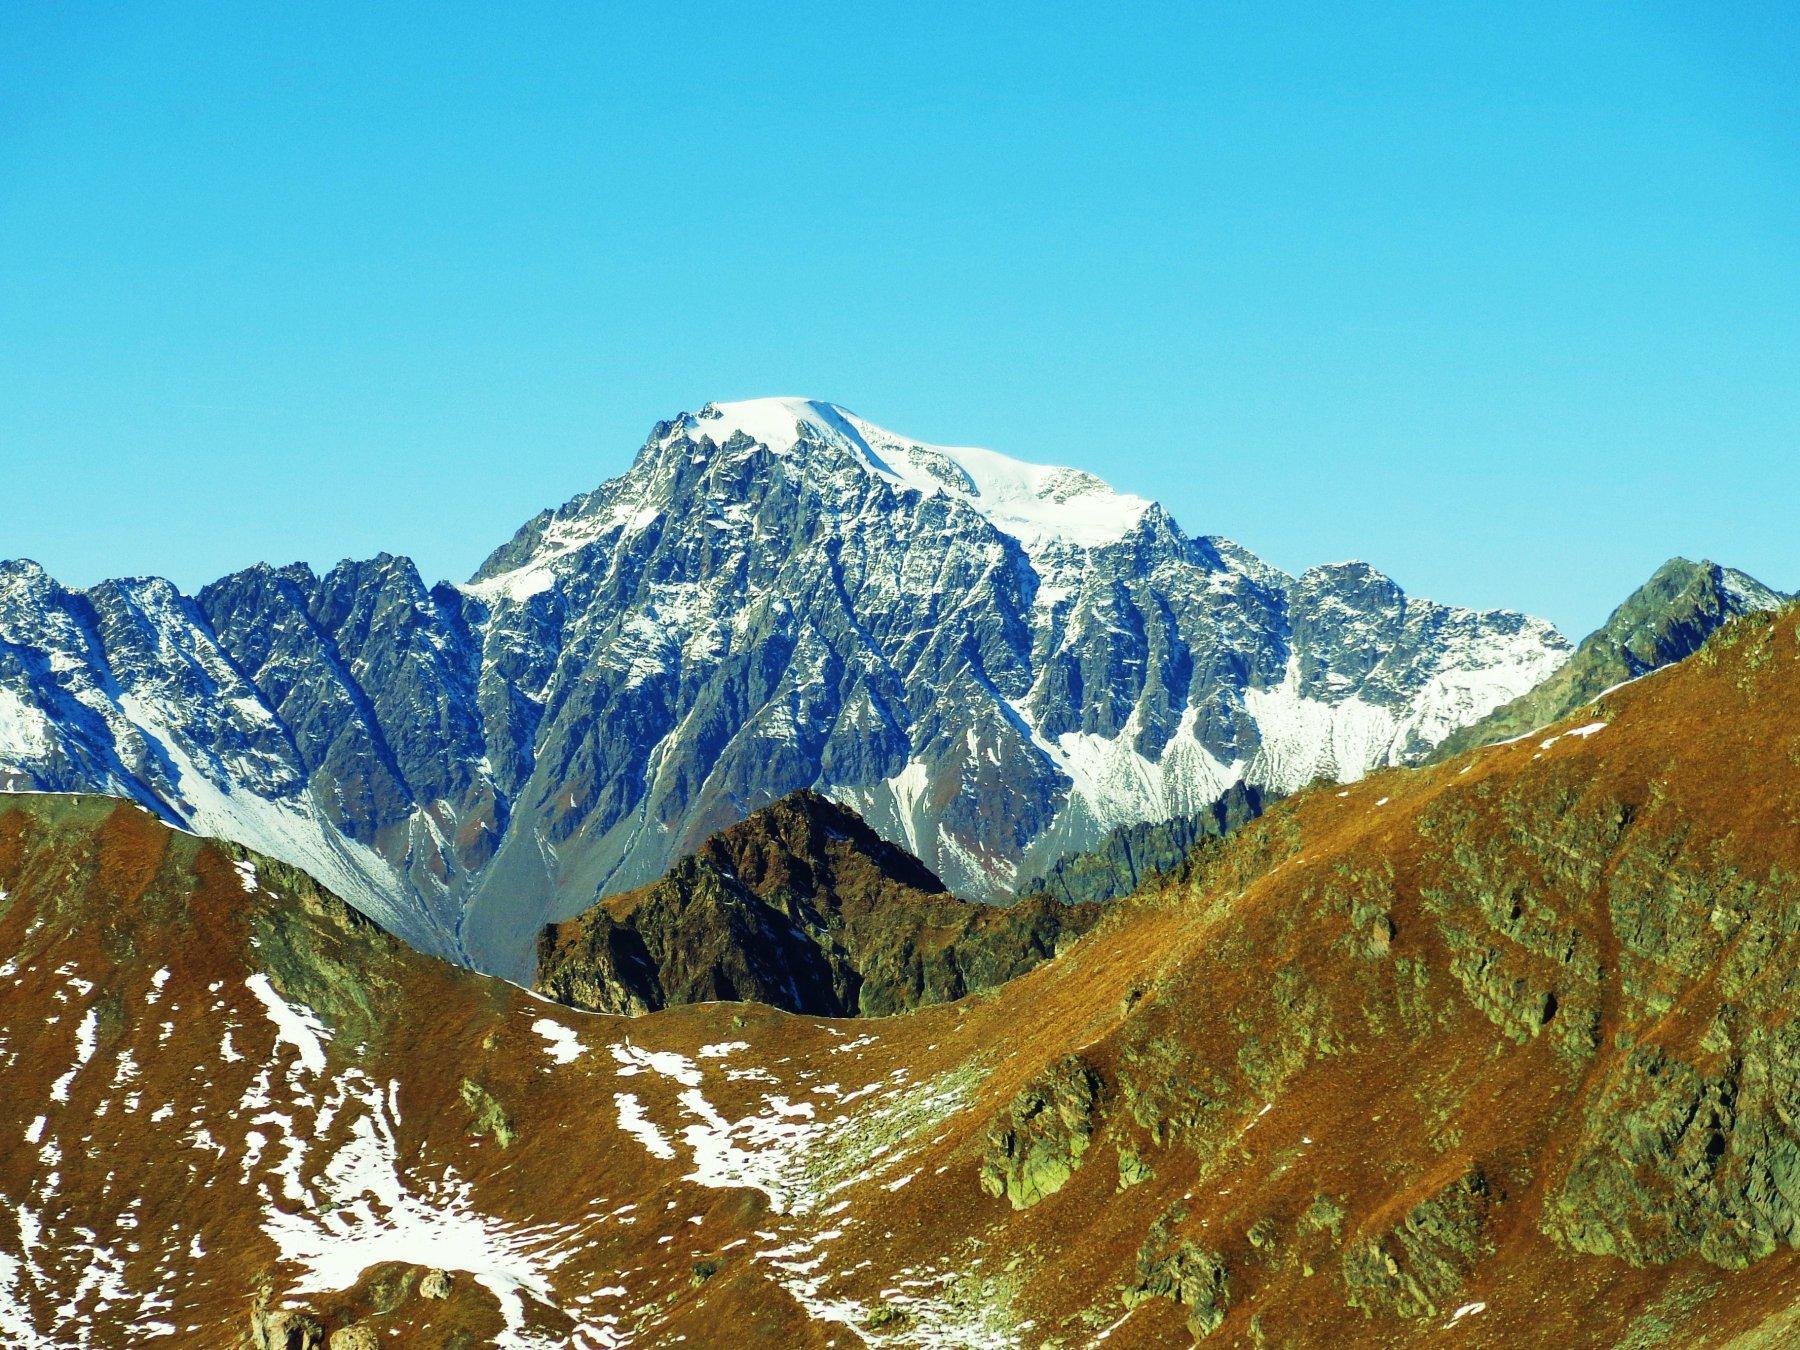 Sguardo verso il Colle Saint Barthelemy e Mont Velan